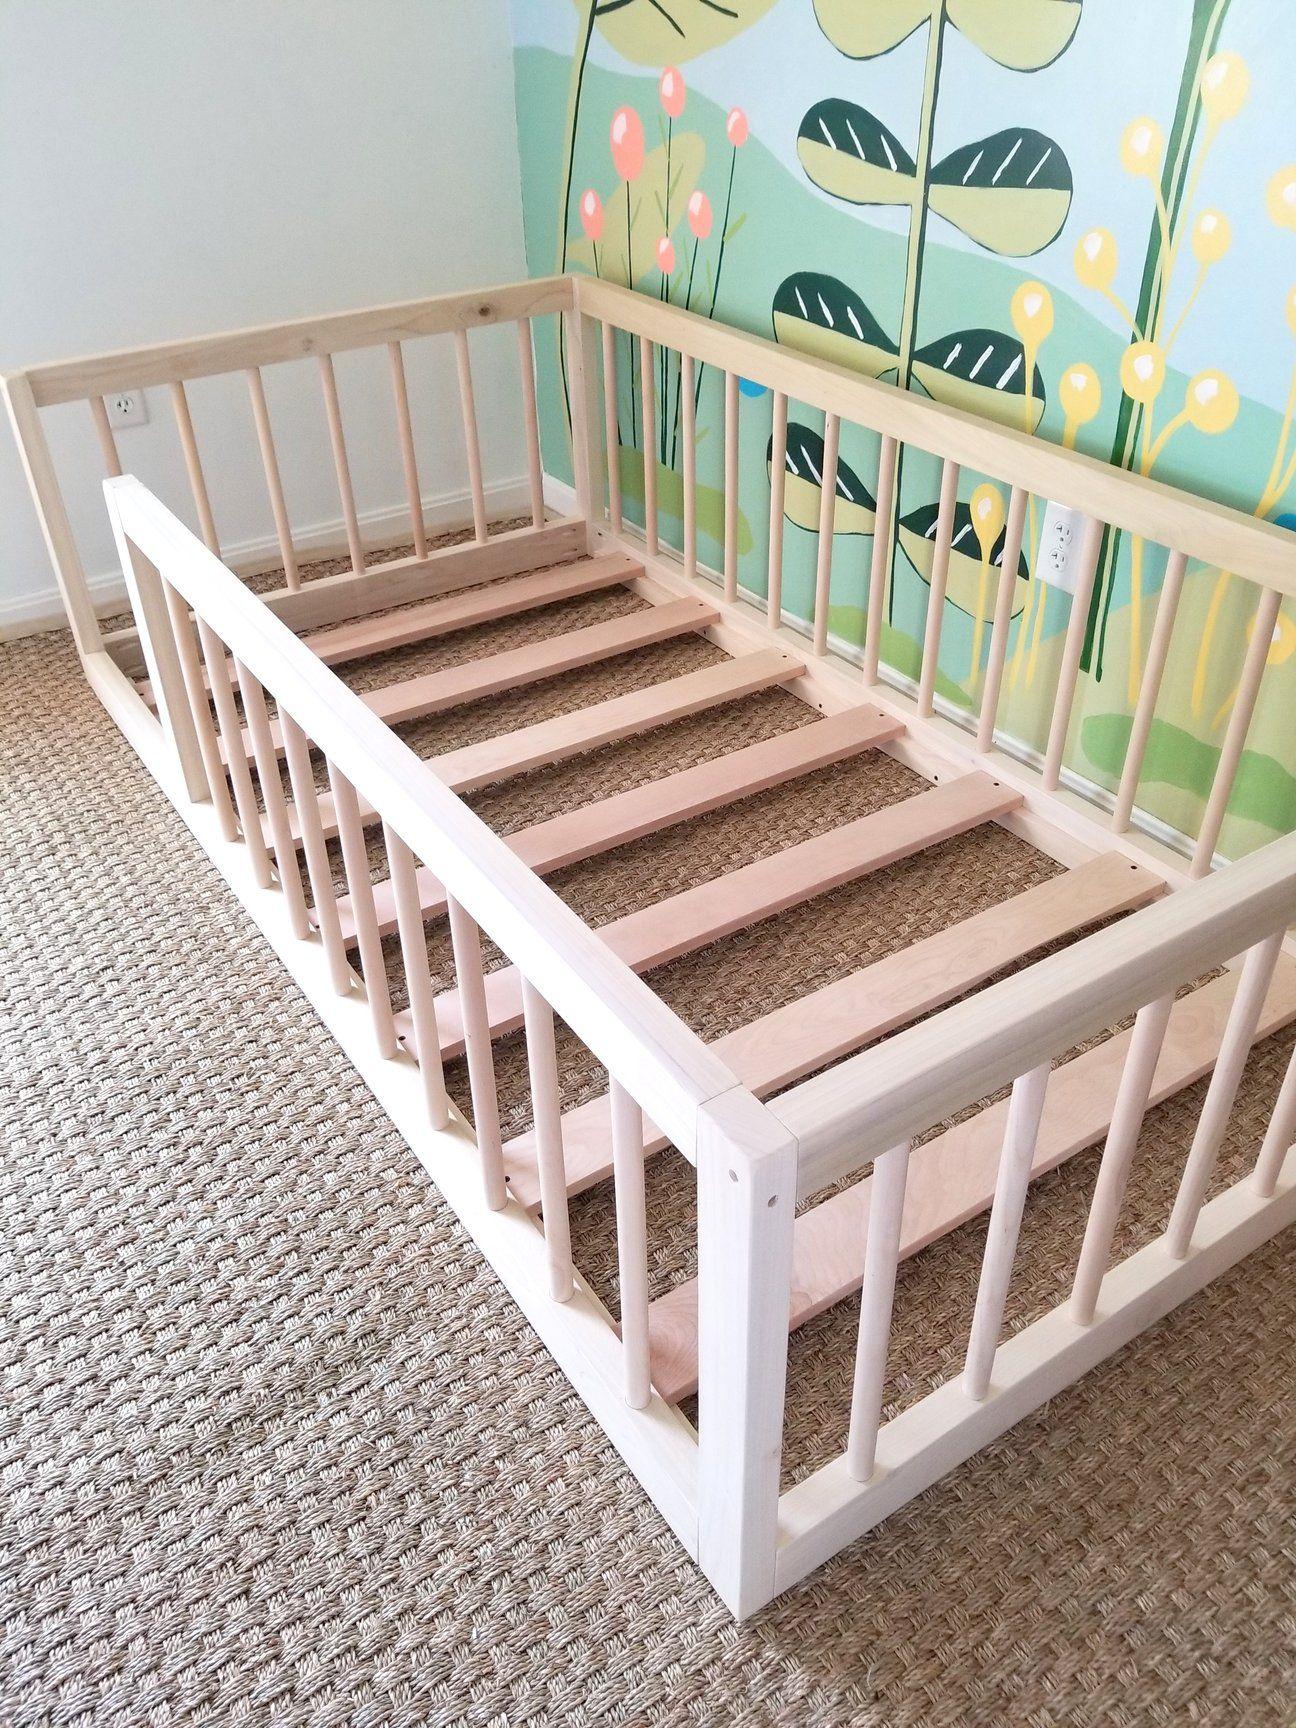 Montessori Floor Bed With Rails Twin Size In 2020 Toddler Floor